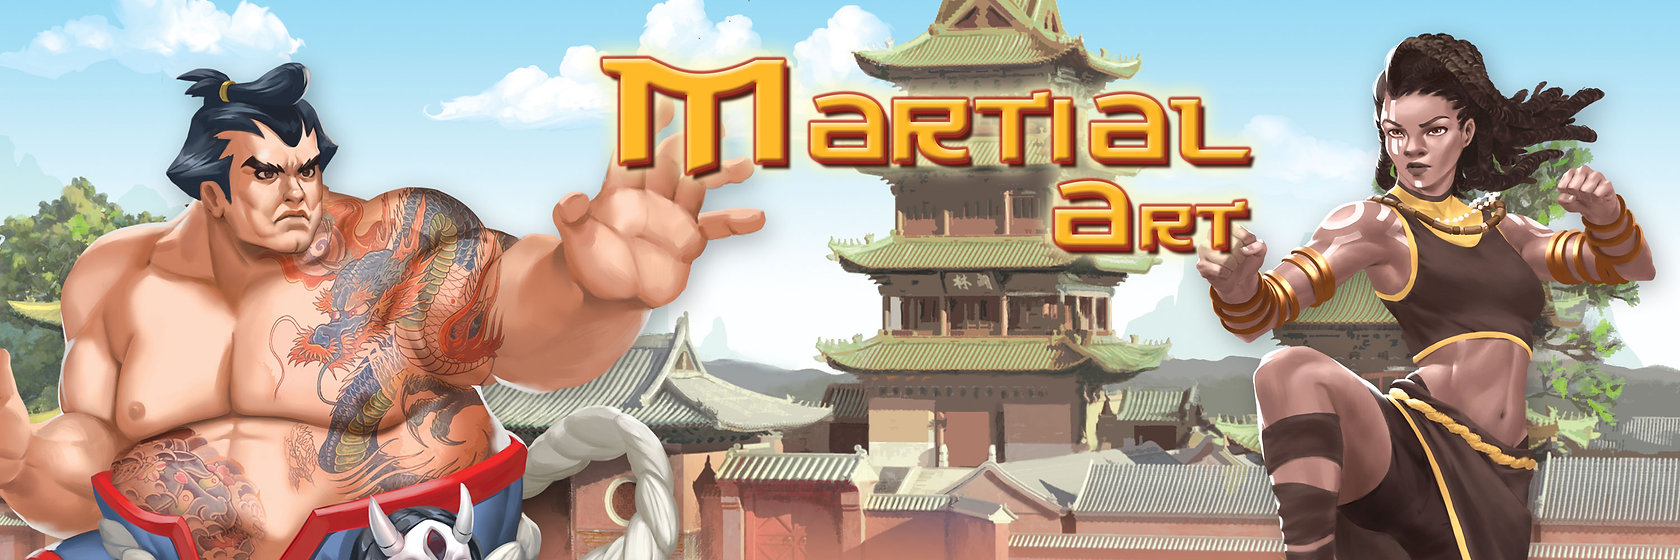 bandeau_martial_art.jpg